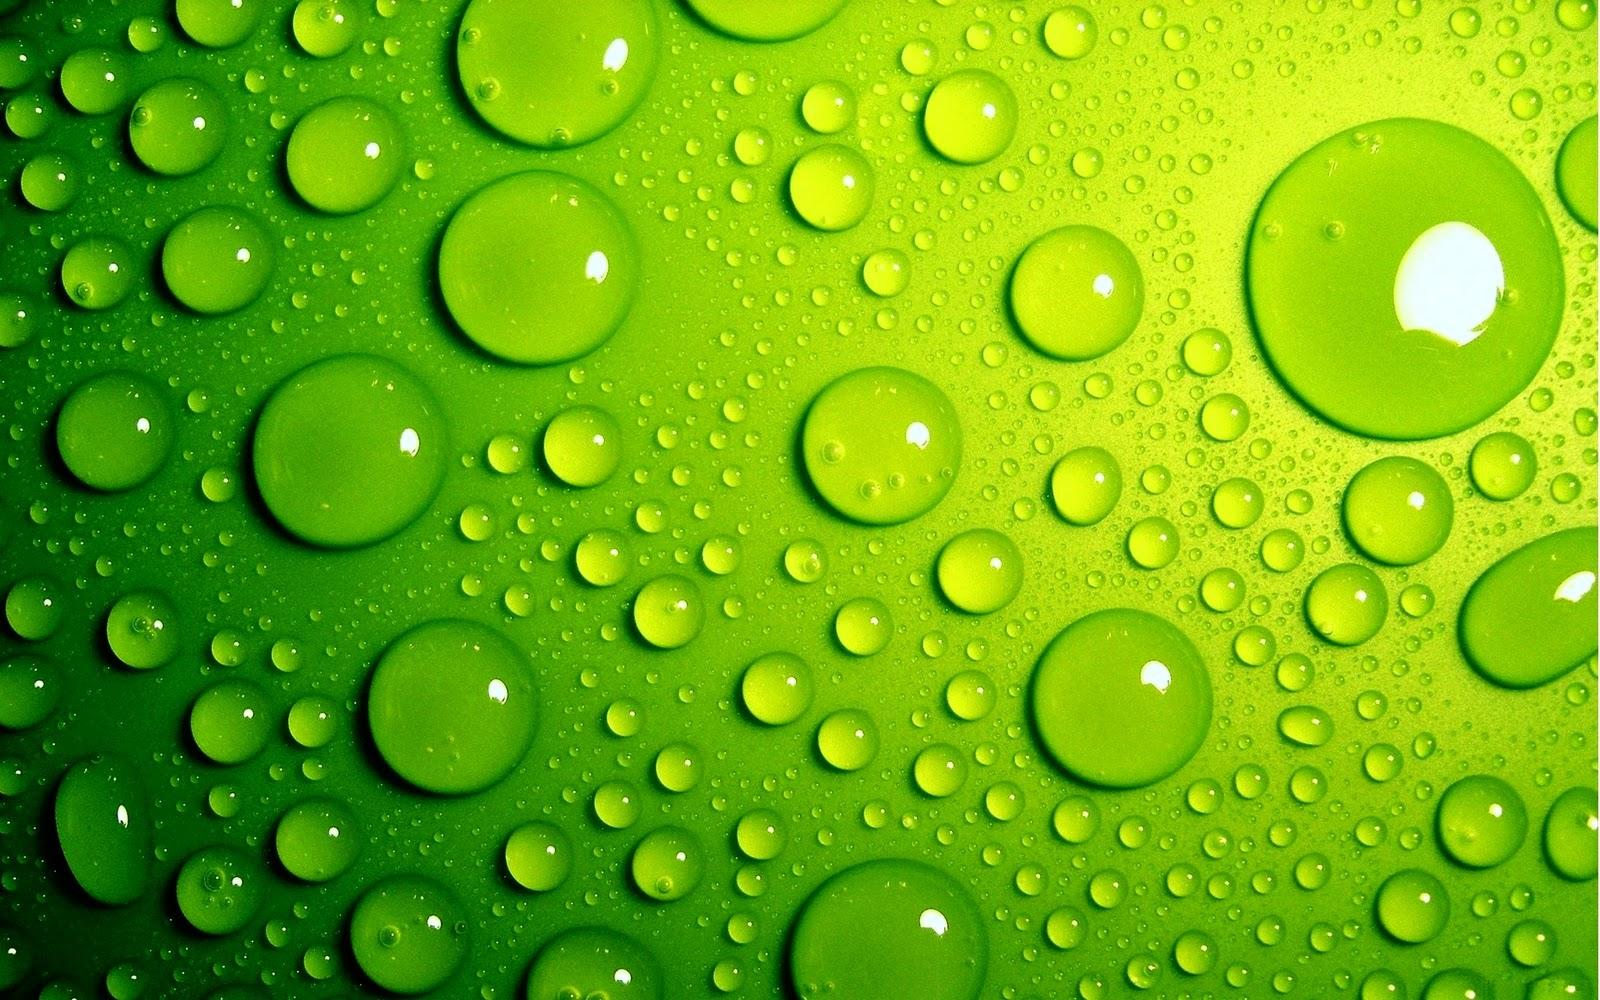 http://4.bp.blogspot.com/-xO12JPCRlaQ/TrArrwxbQTI/AAAAAAAAAmY/oY5hBDeMfQY/s1600/green-bubbles-HD_wallpapers.jpg